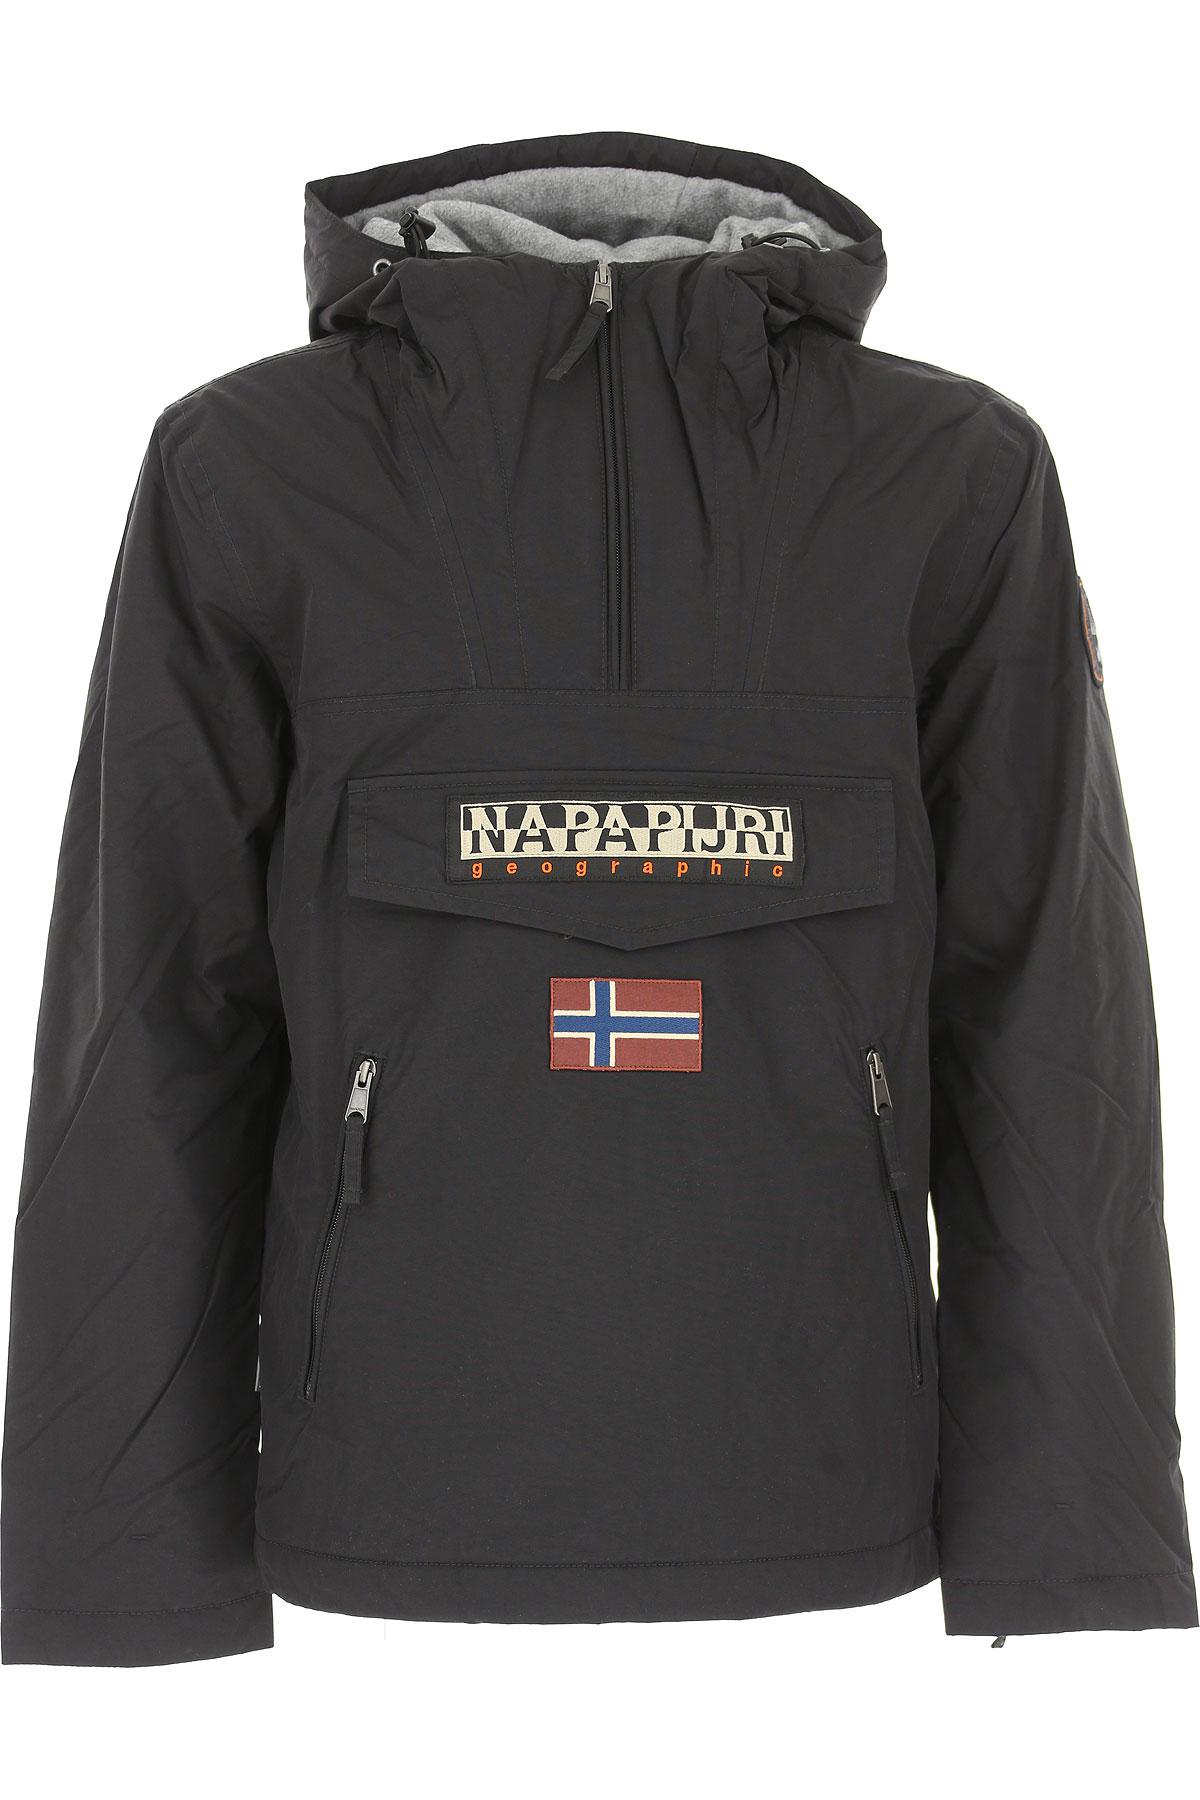 Image of Napapijri Down Jacket for Men, Puffer Ski Jacket, Black, polyestere, 2017, L M XL XS